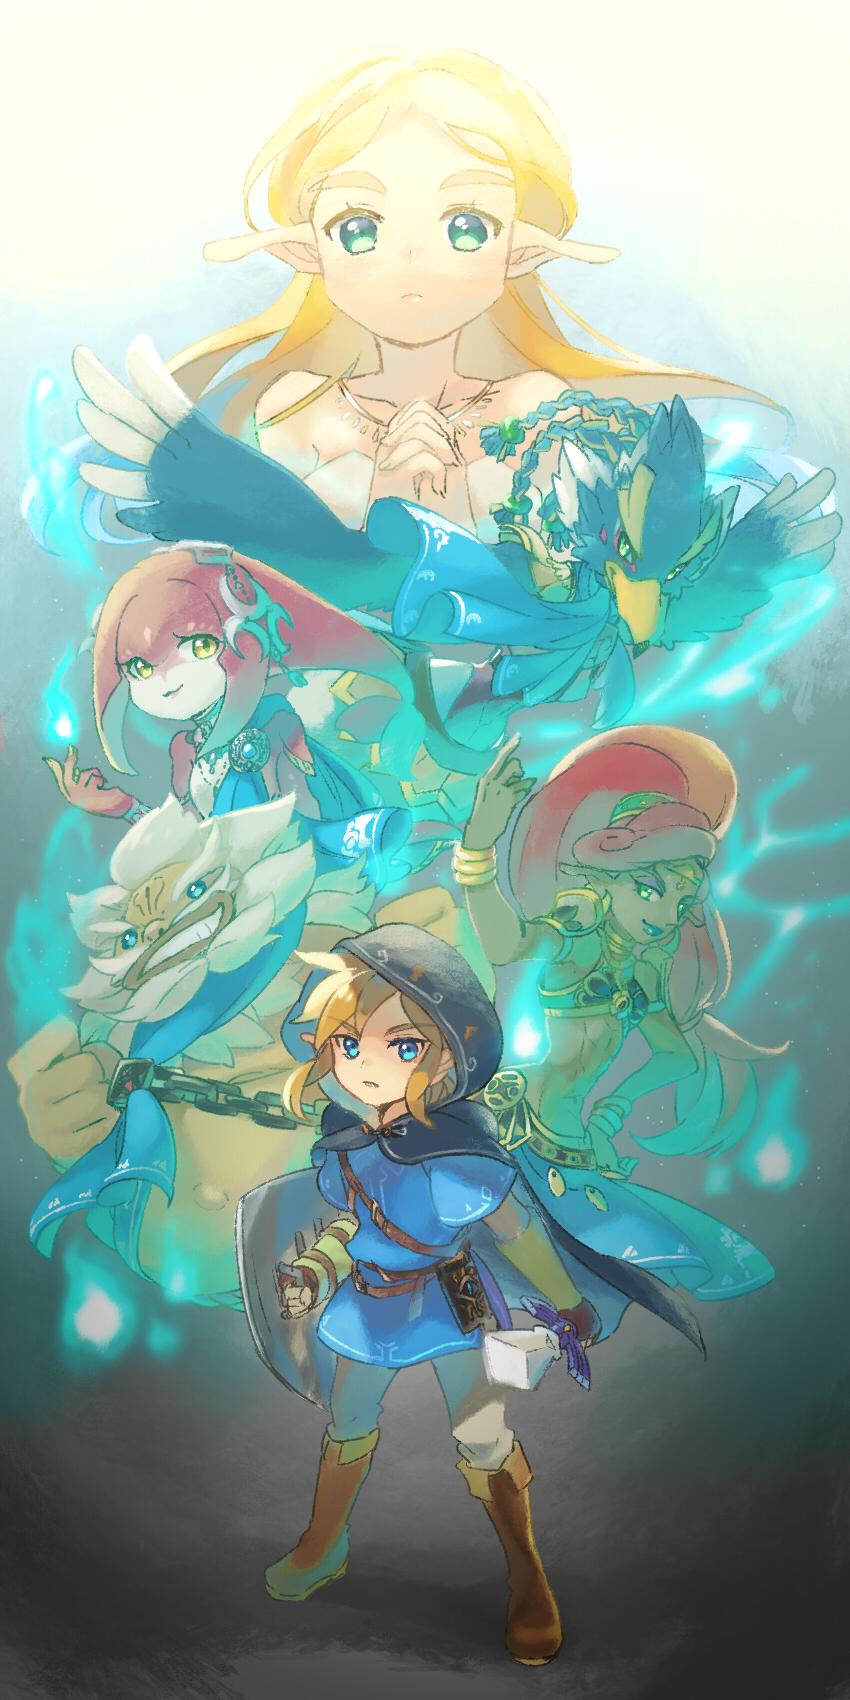 Zelda No Densetsu Breath Of The Wild The Legend Of Zelda Breath